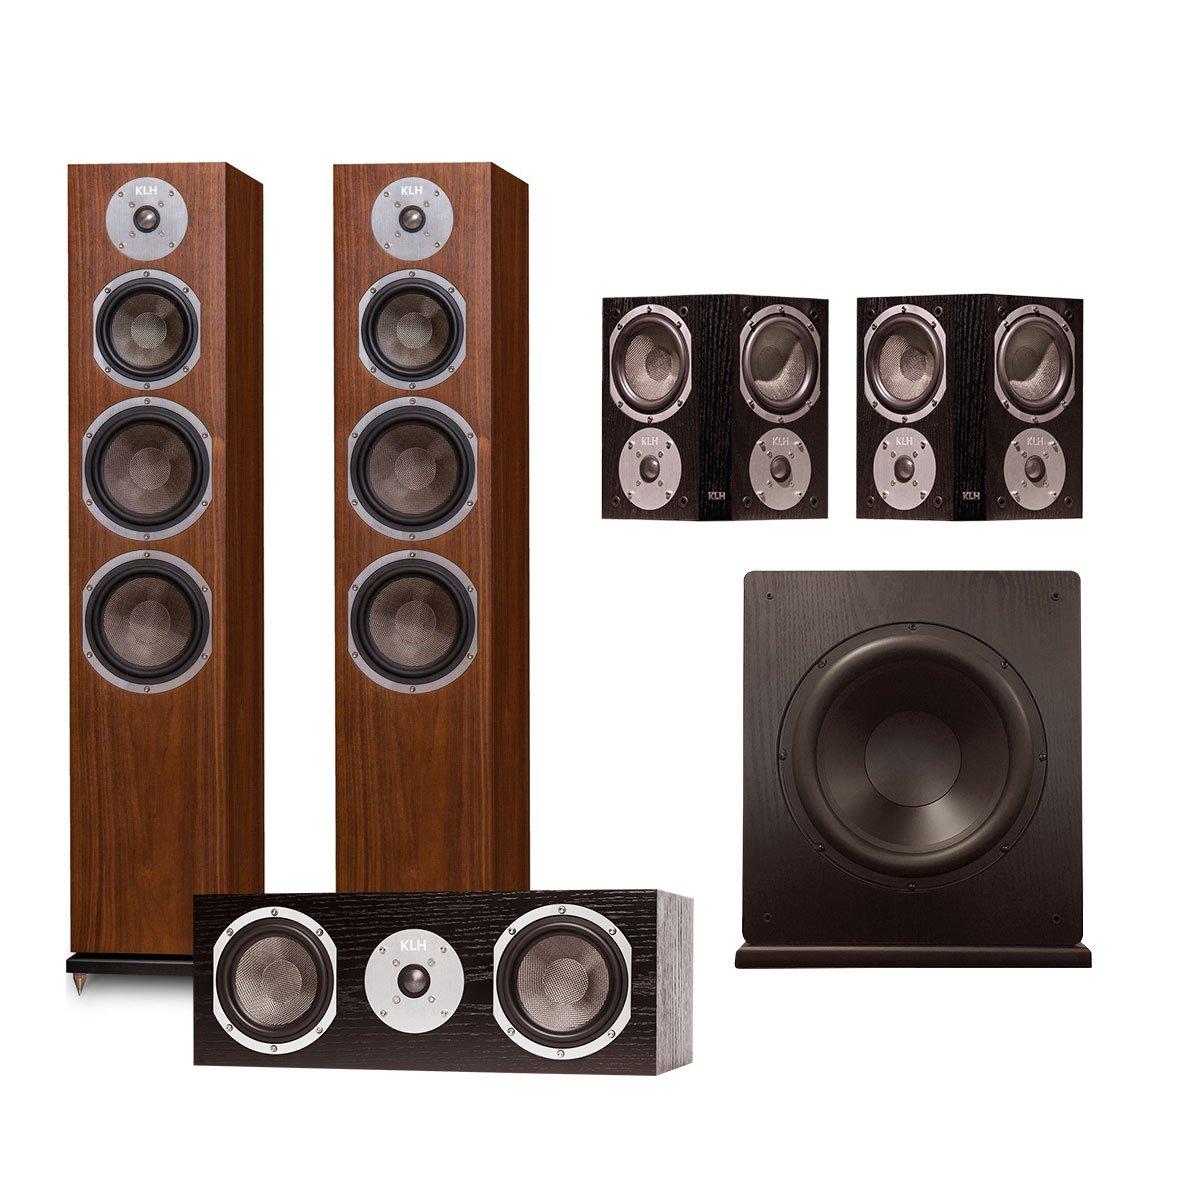 KLH Kendall 5.1 Speaker System (Walnut)